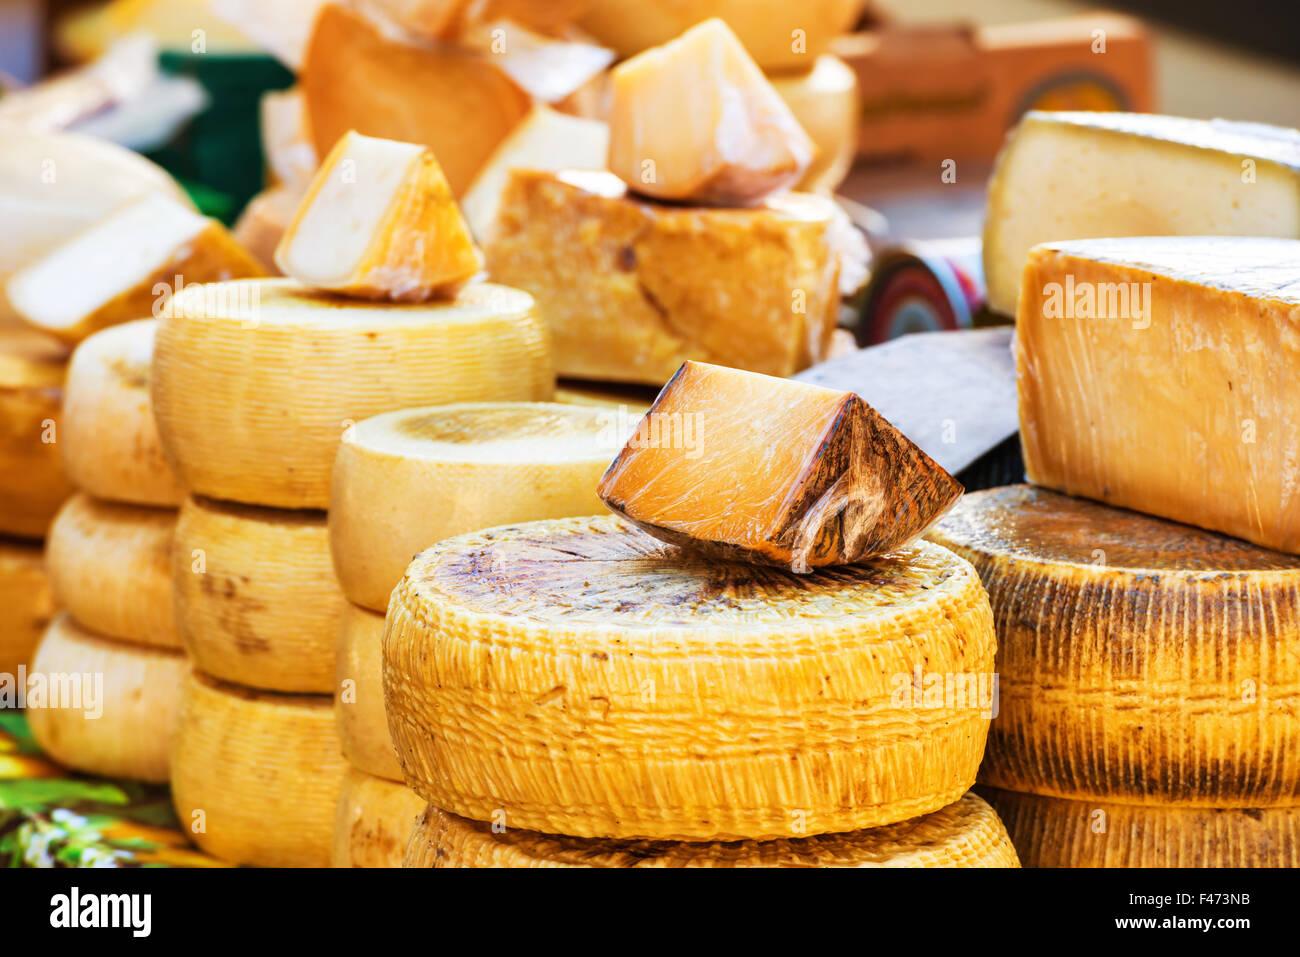 Diferentes tipos de queso italiano Imagen De Stock